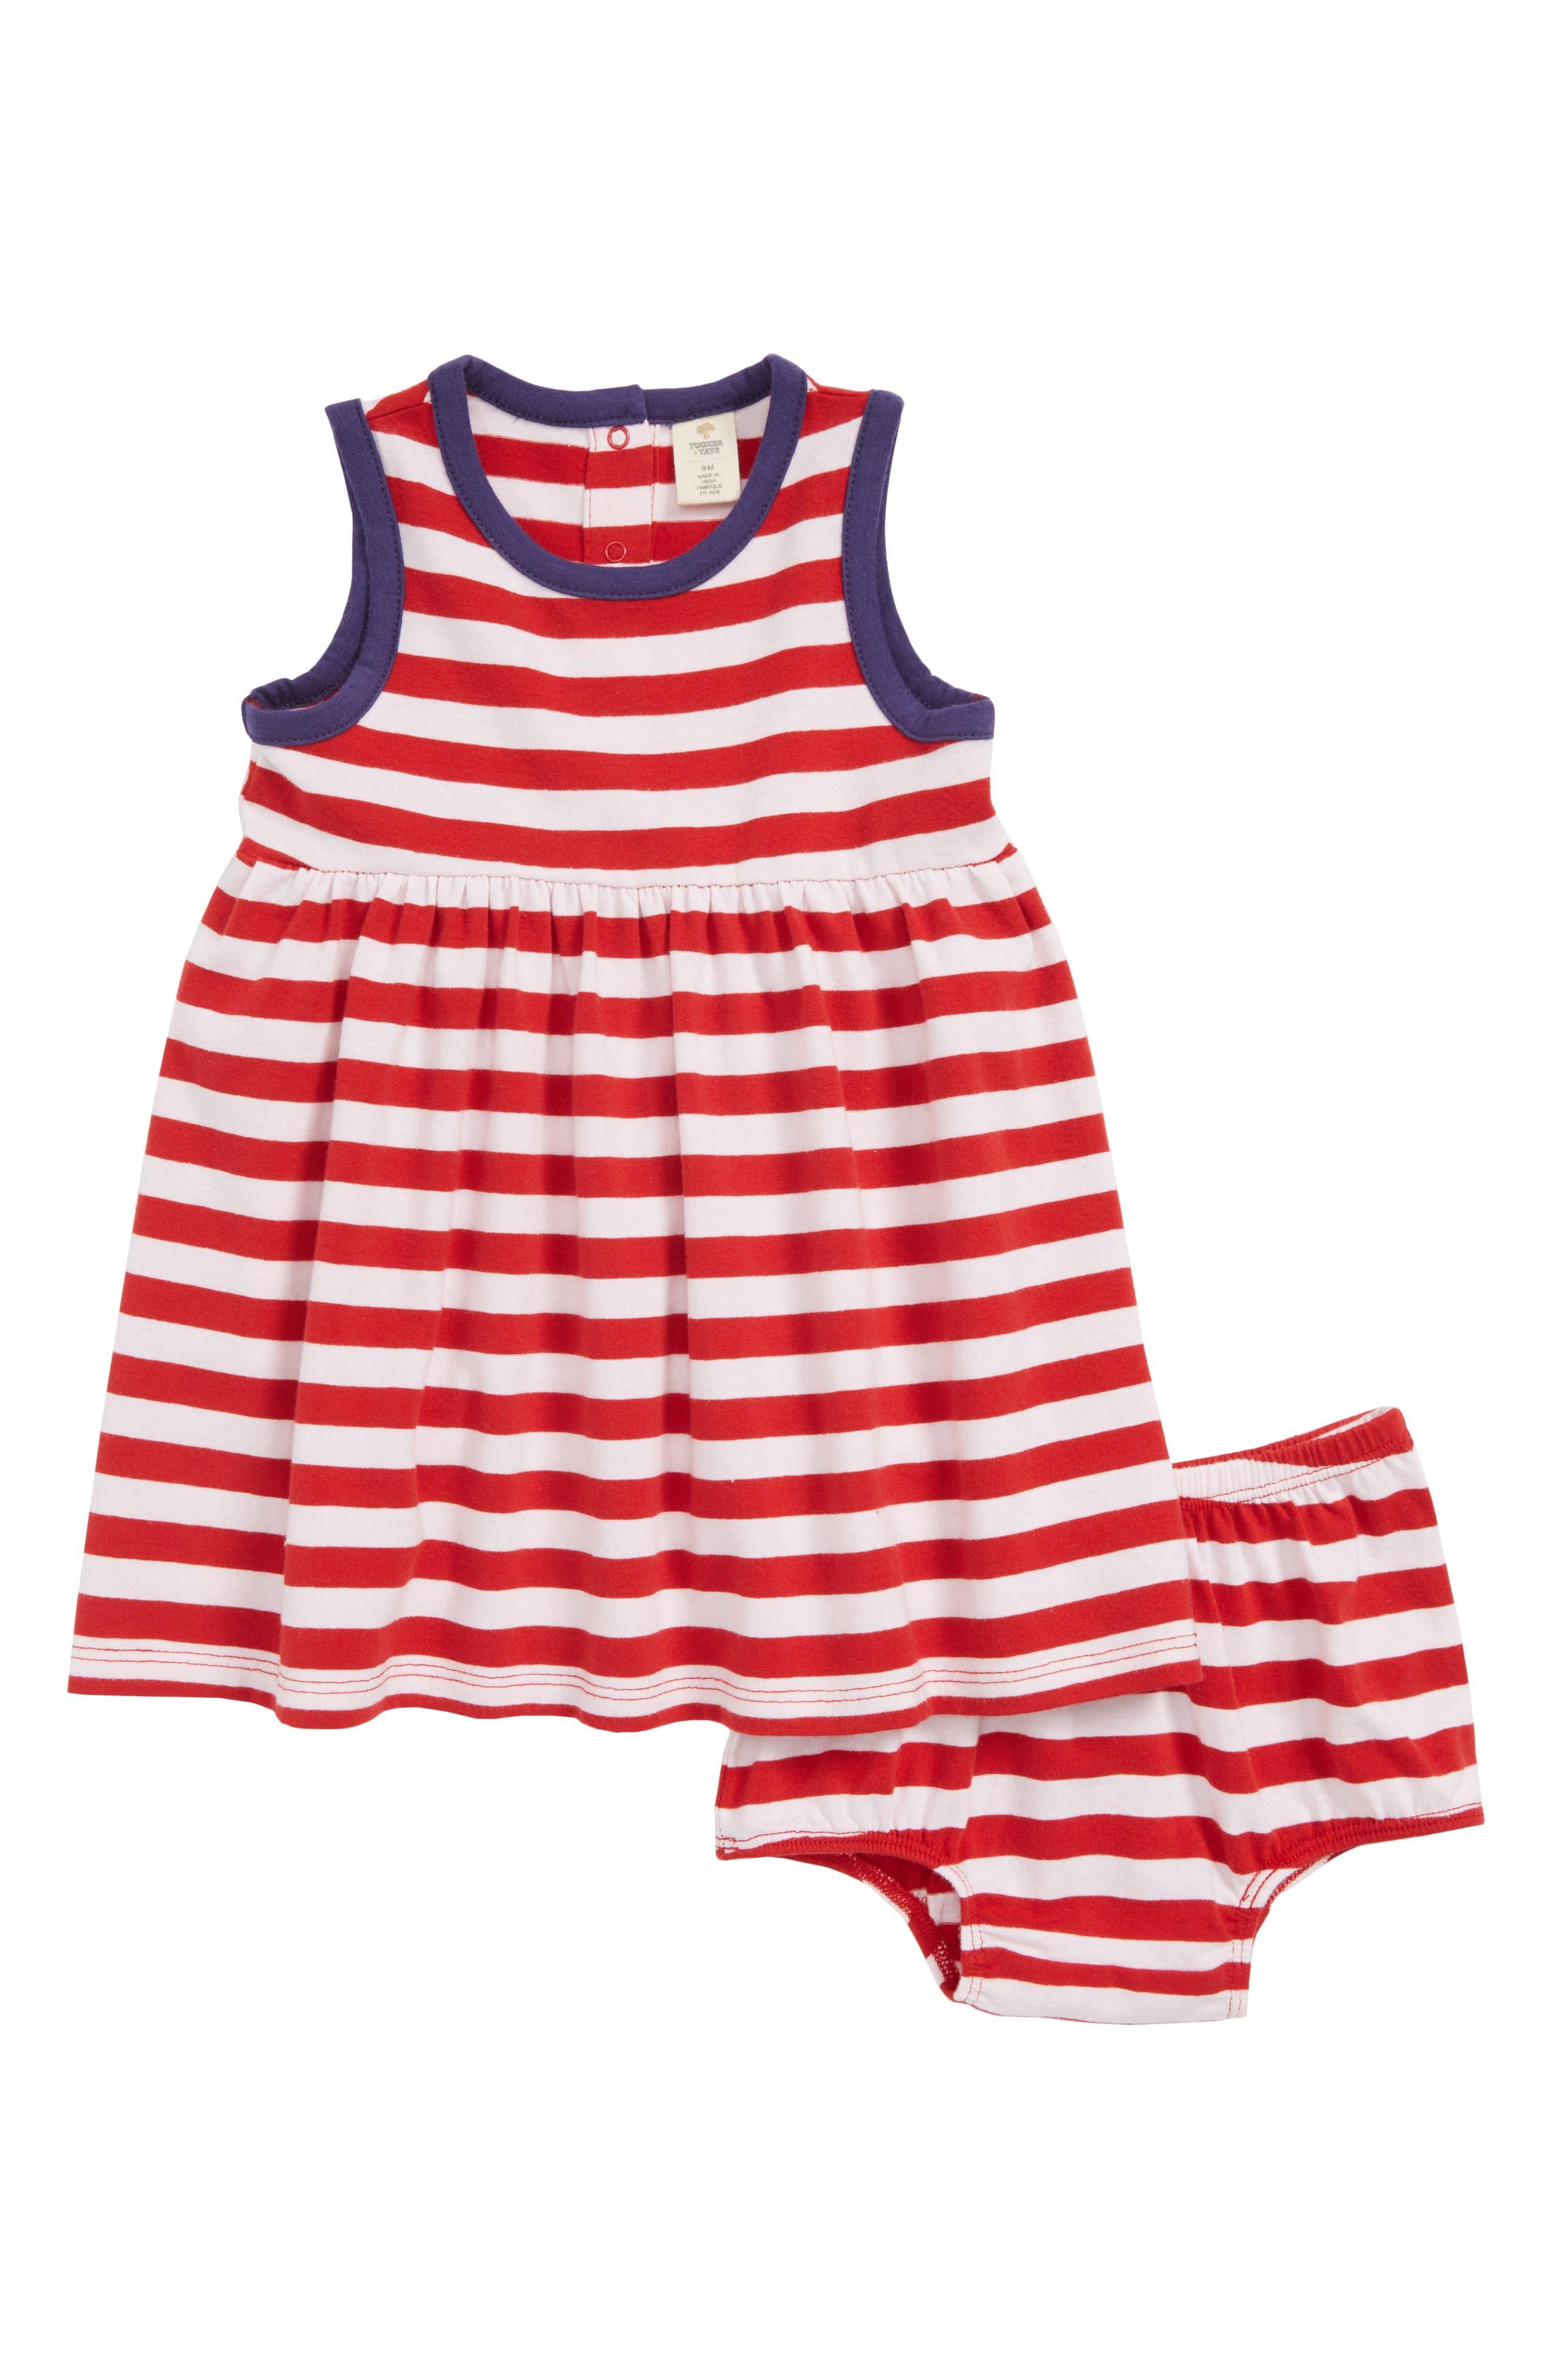 Easy Knit Stripe Dress,                             Main thumbnail 1, color,                             Red Samba- White Stripe